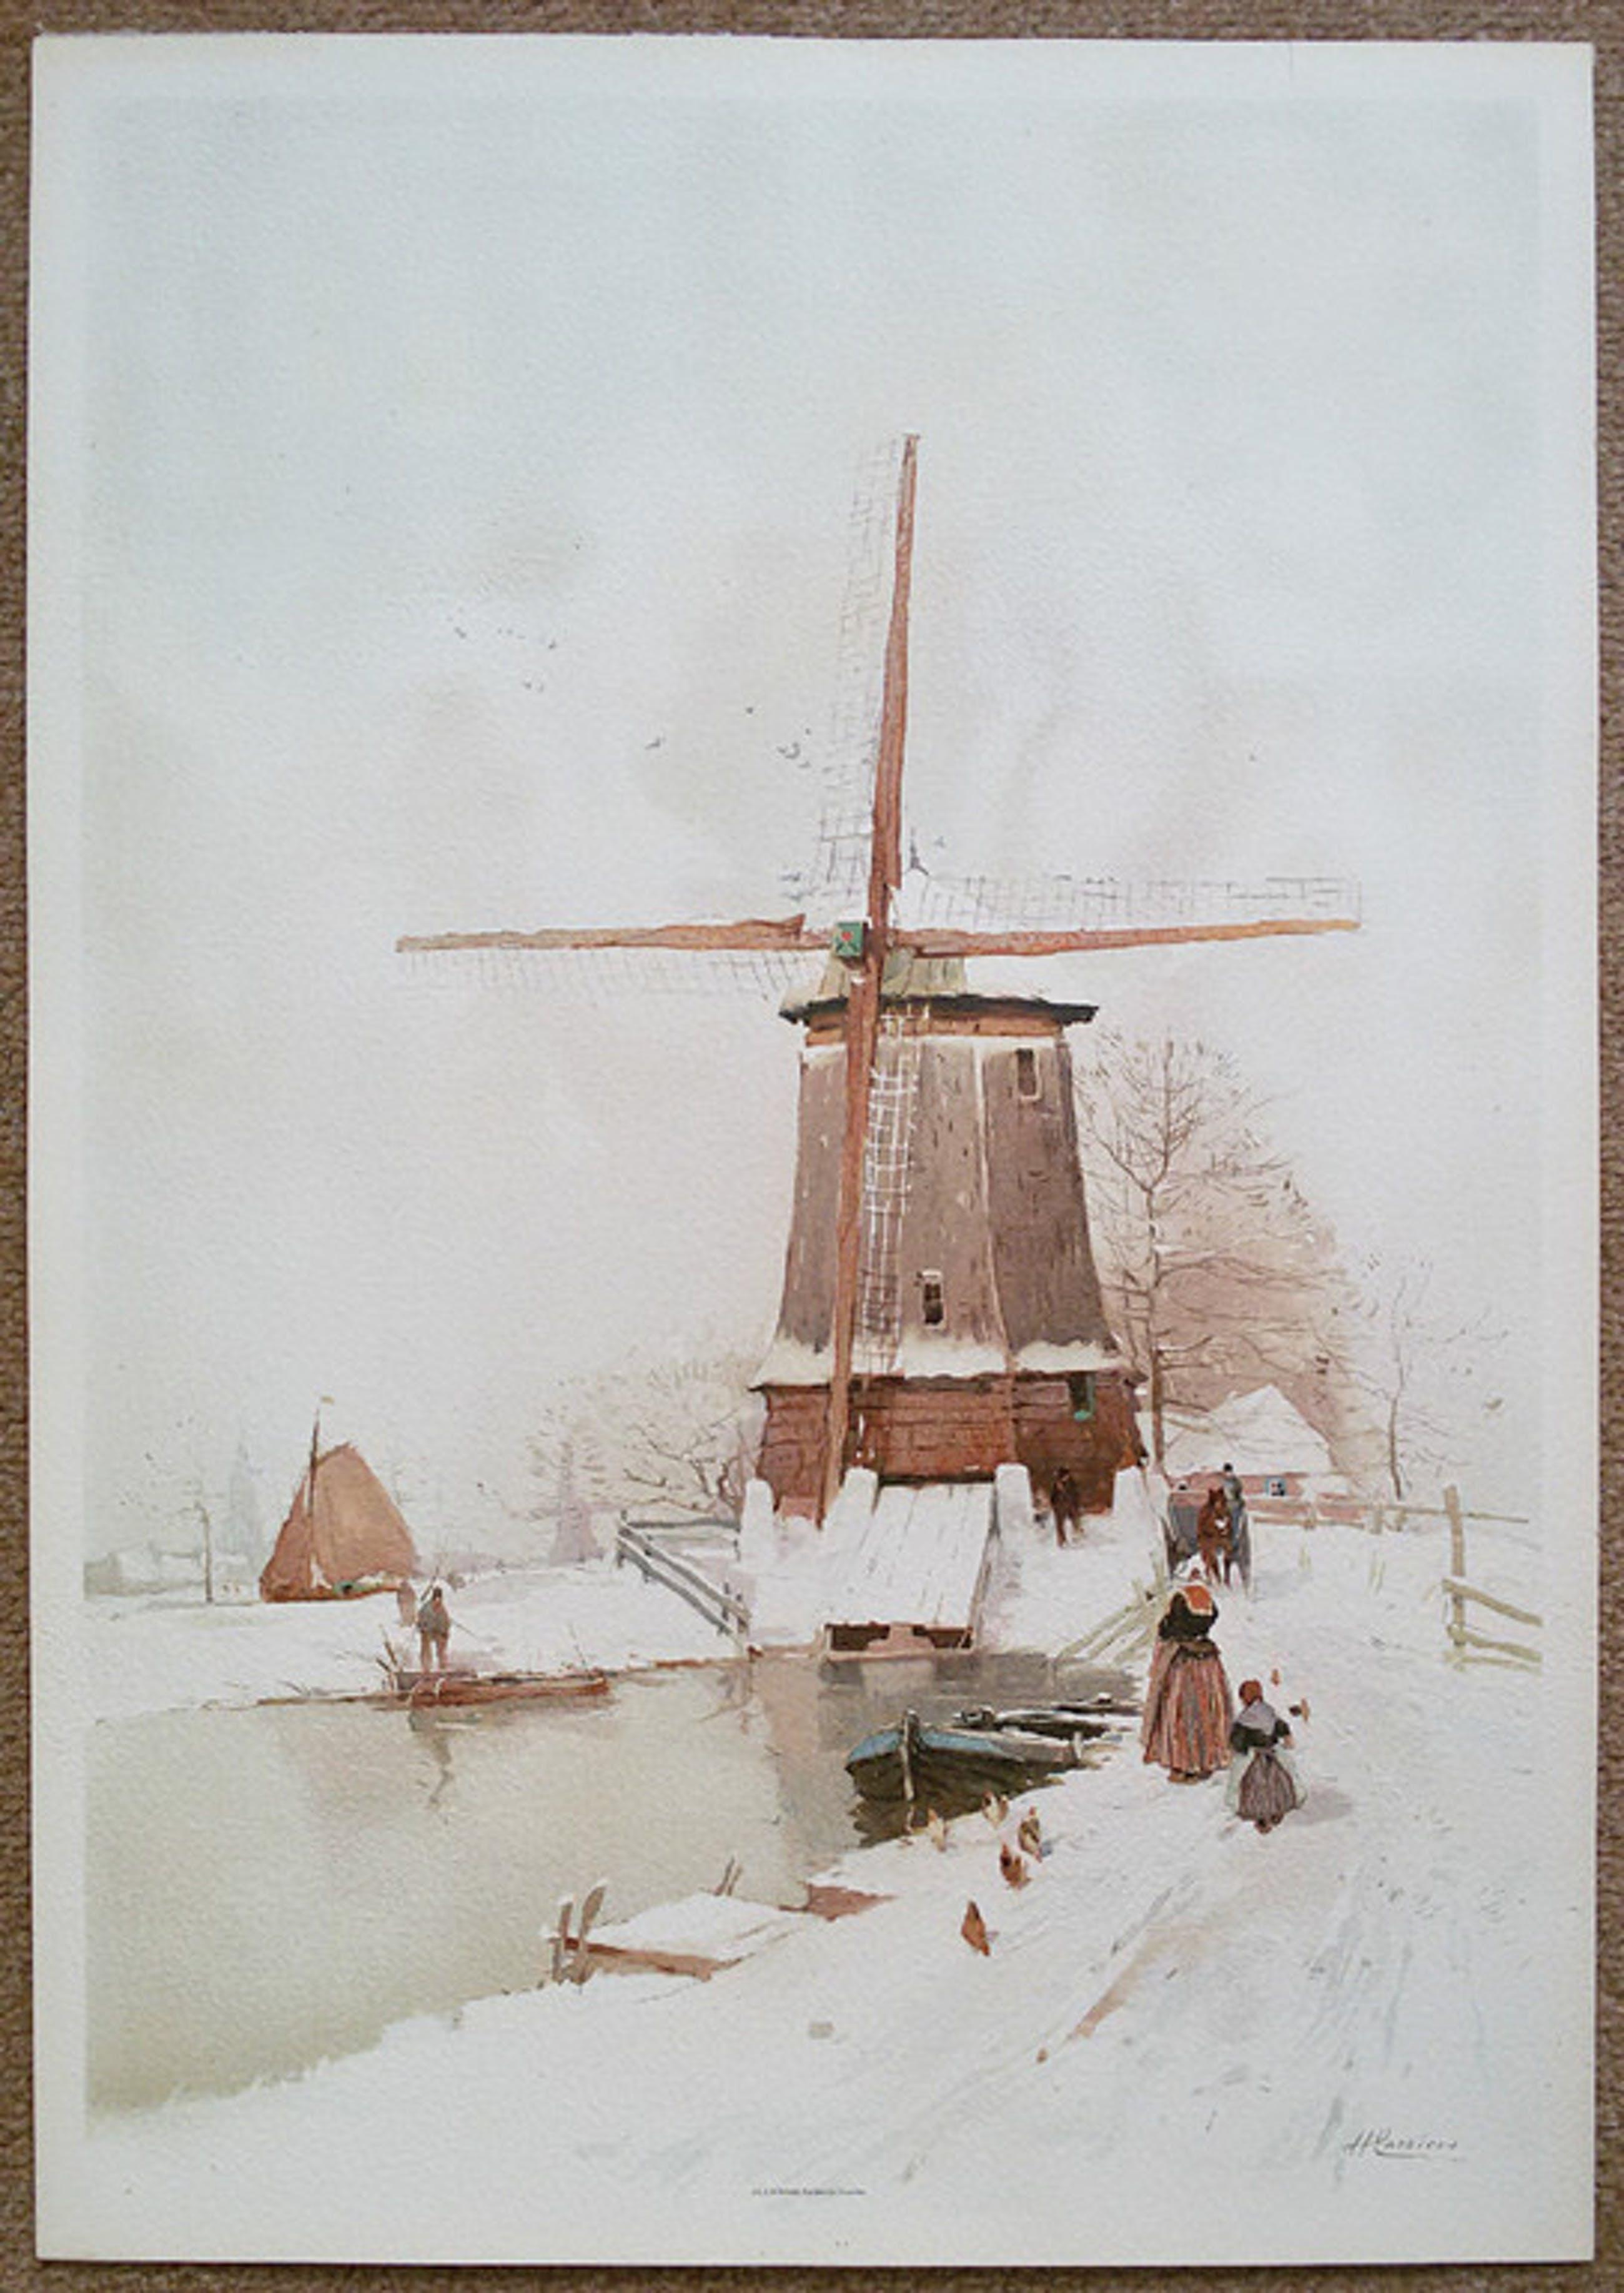 Henri Cassiers - Winters Nederland, chromolithografie kopen? Bied vanaf 30!